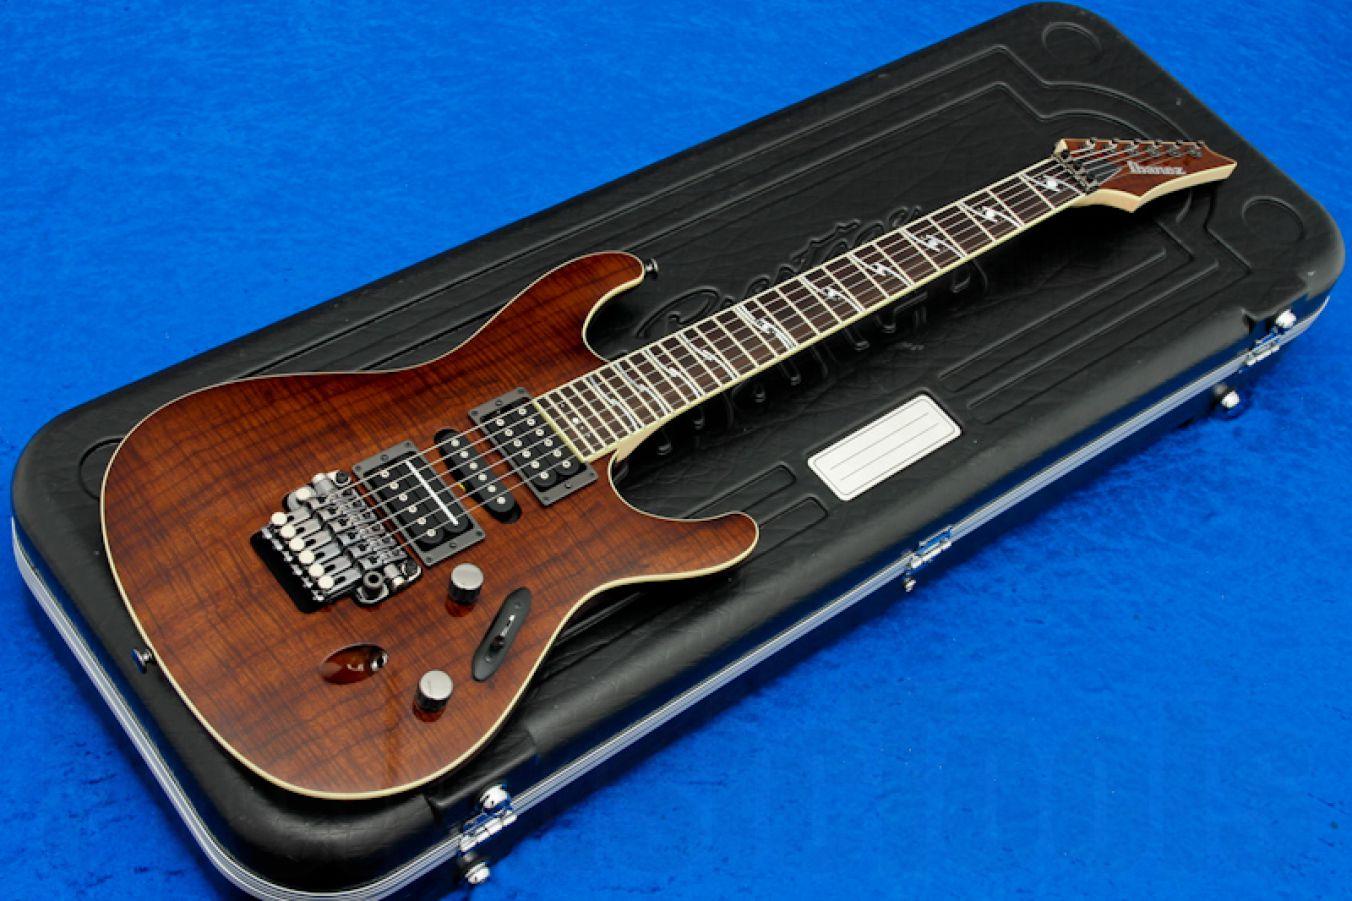 Ibanez 60-S5470K KB Prestige - Koa Limited Edition - b-stock (1x opened box)